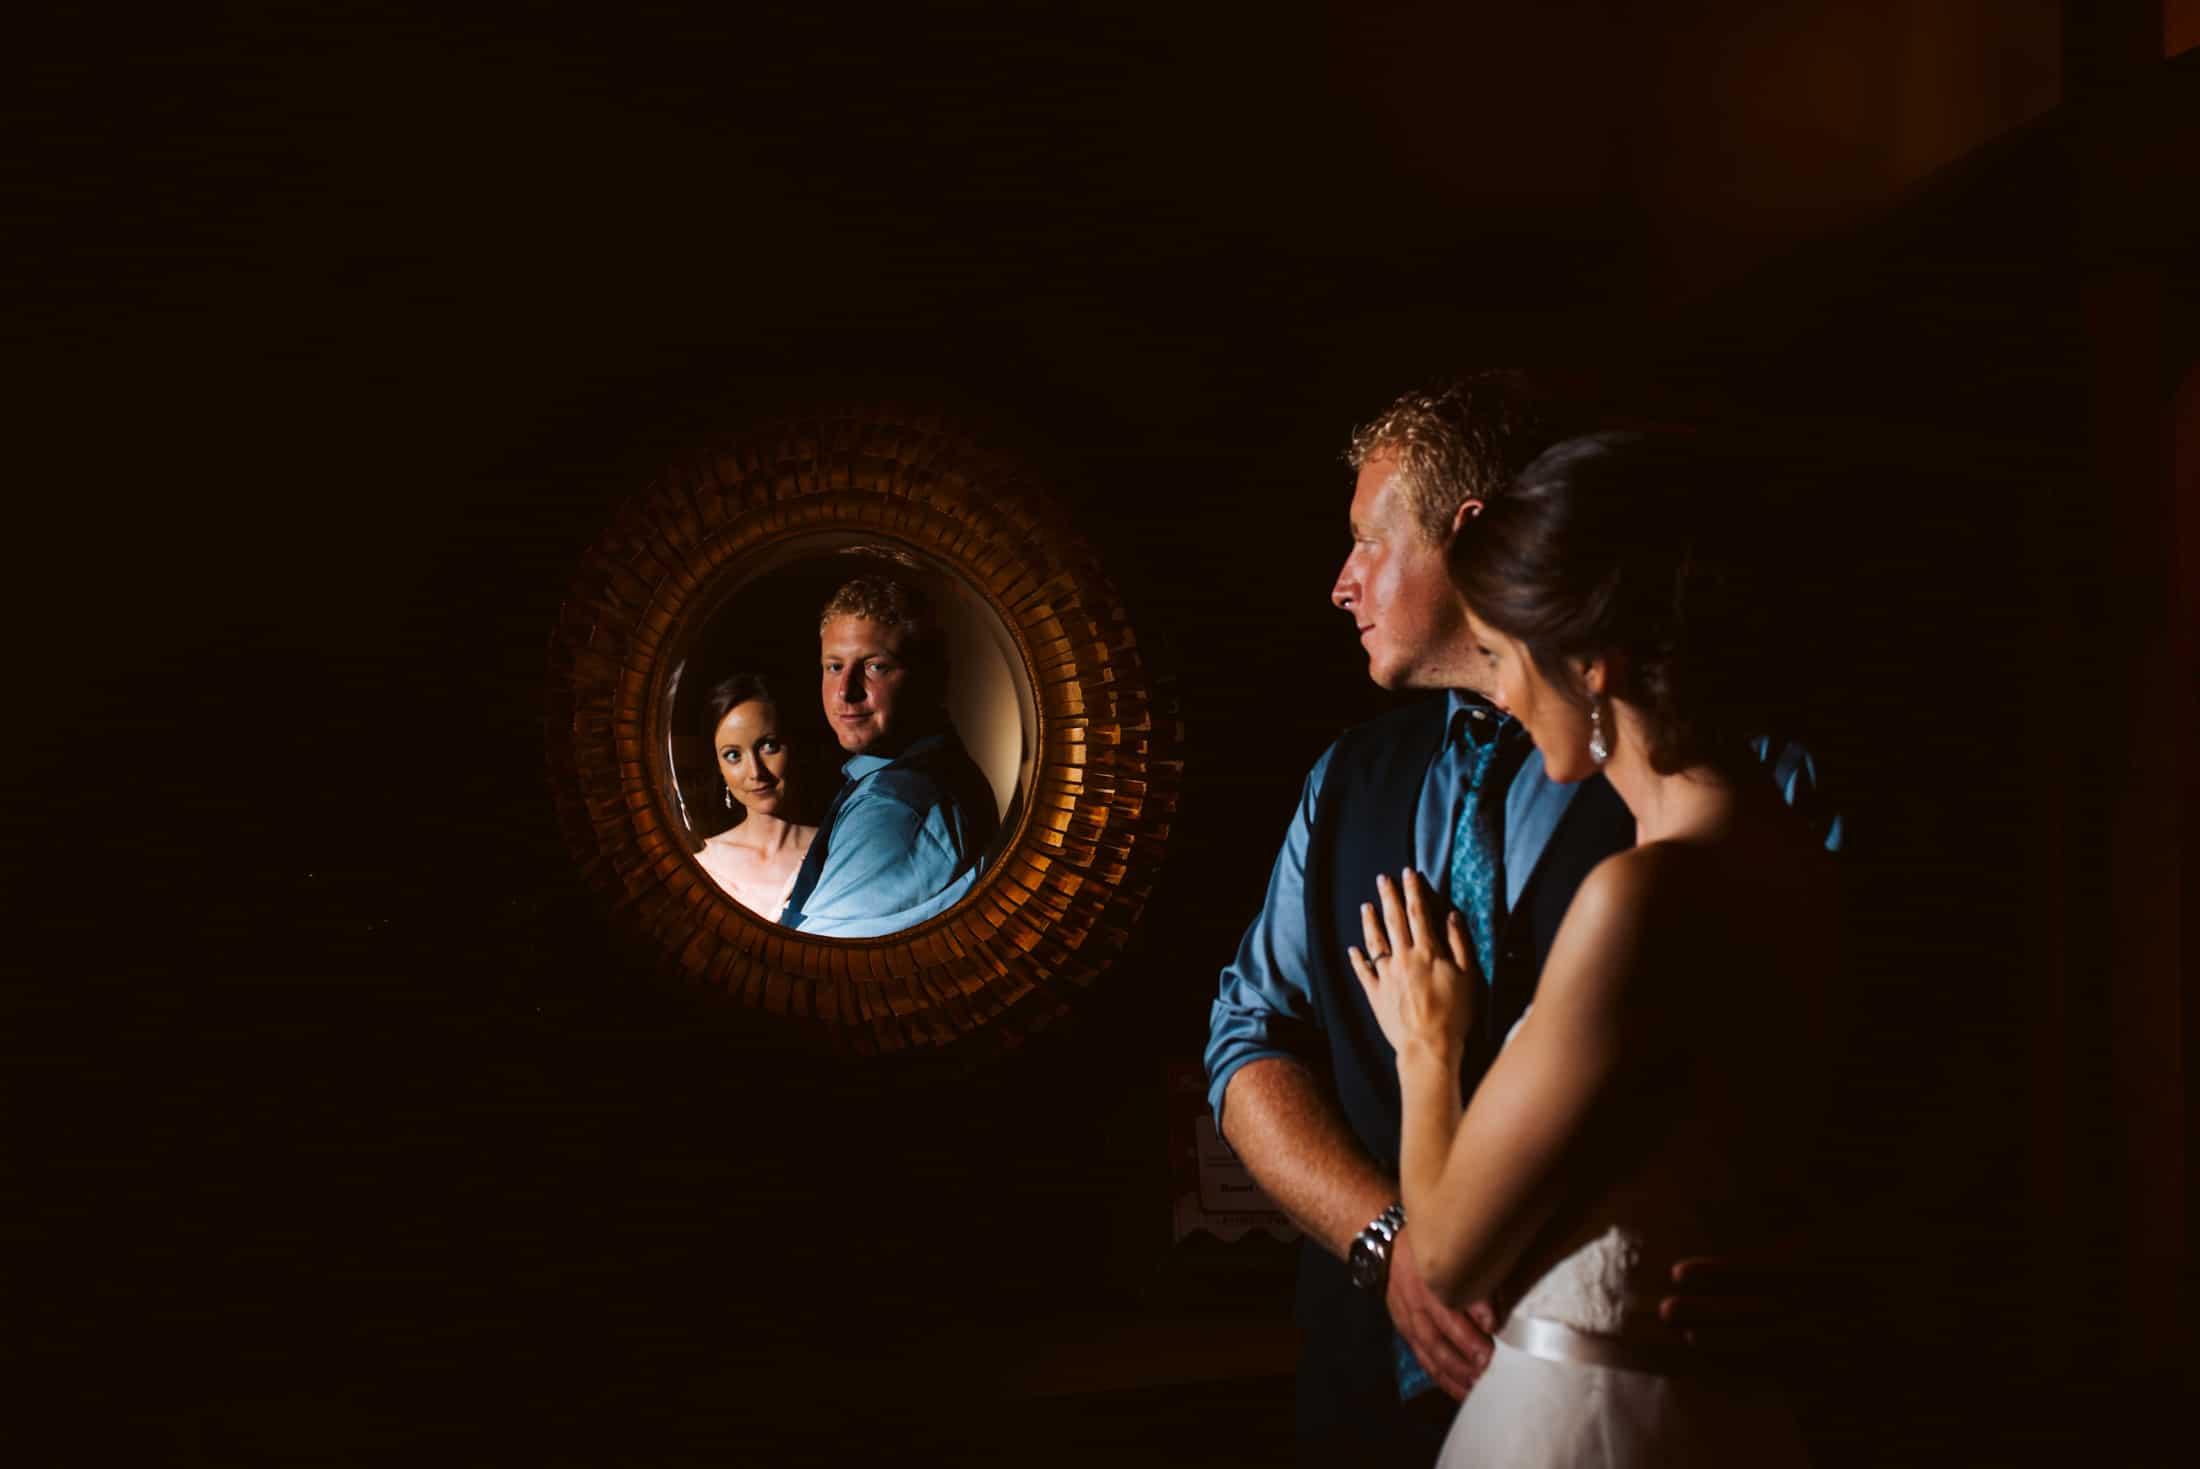 Intimate wedding photographer Jen Hibberd